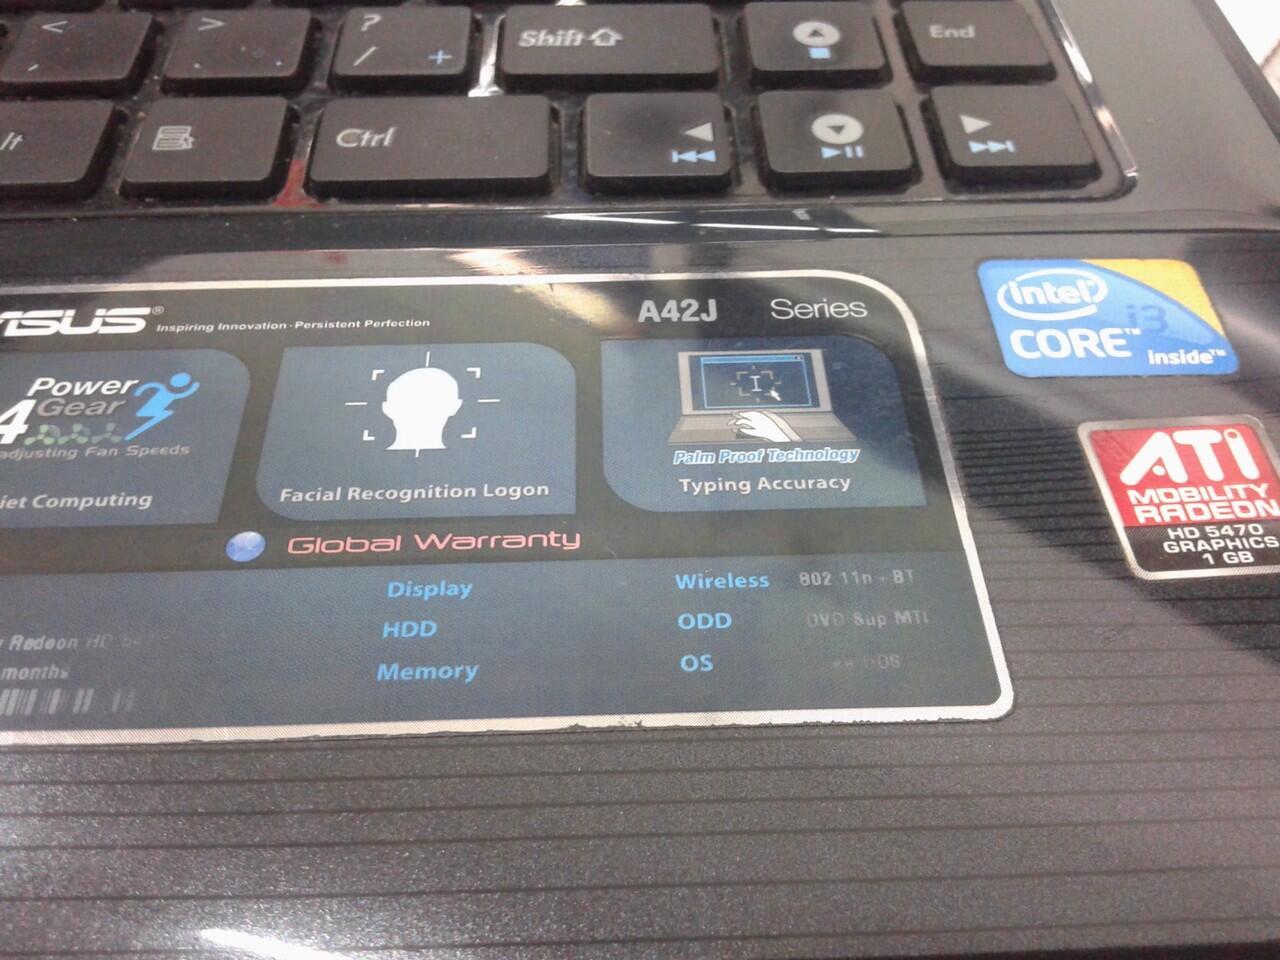 Laptop asus A42J cor i3 ram 4G HD 320G bs di TT semarang